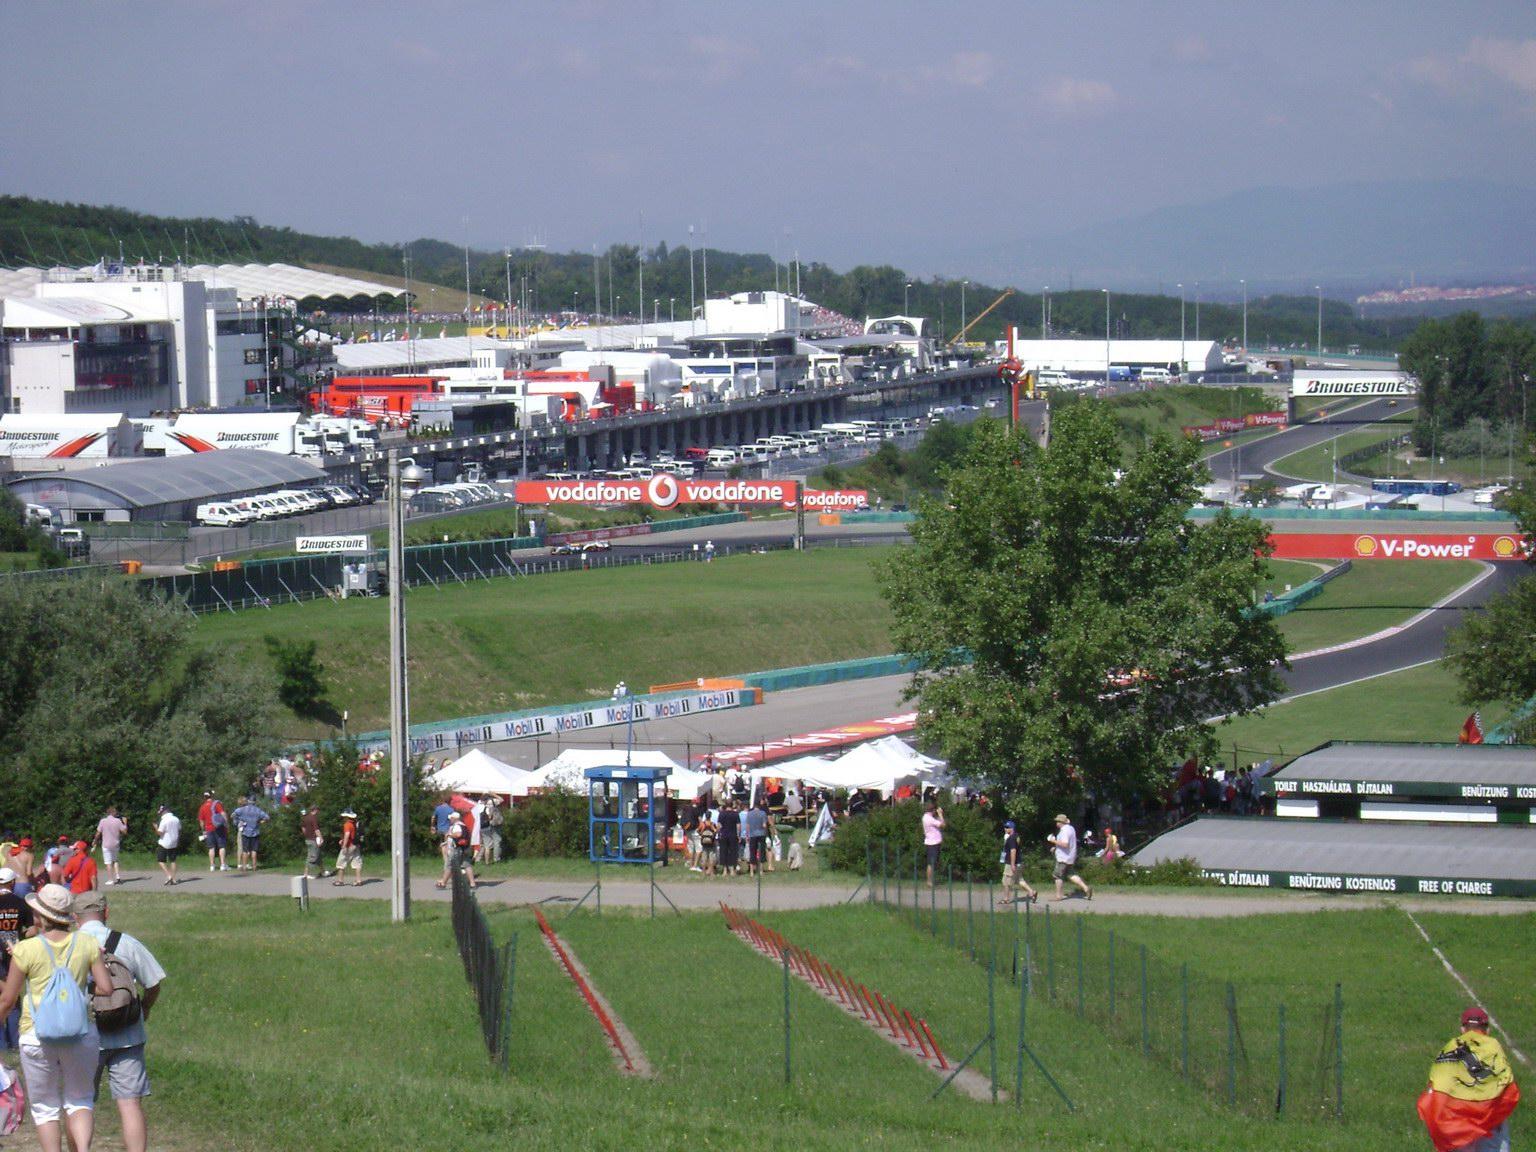 Travelling: Hungaroring Formula 1